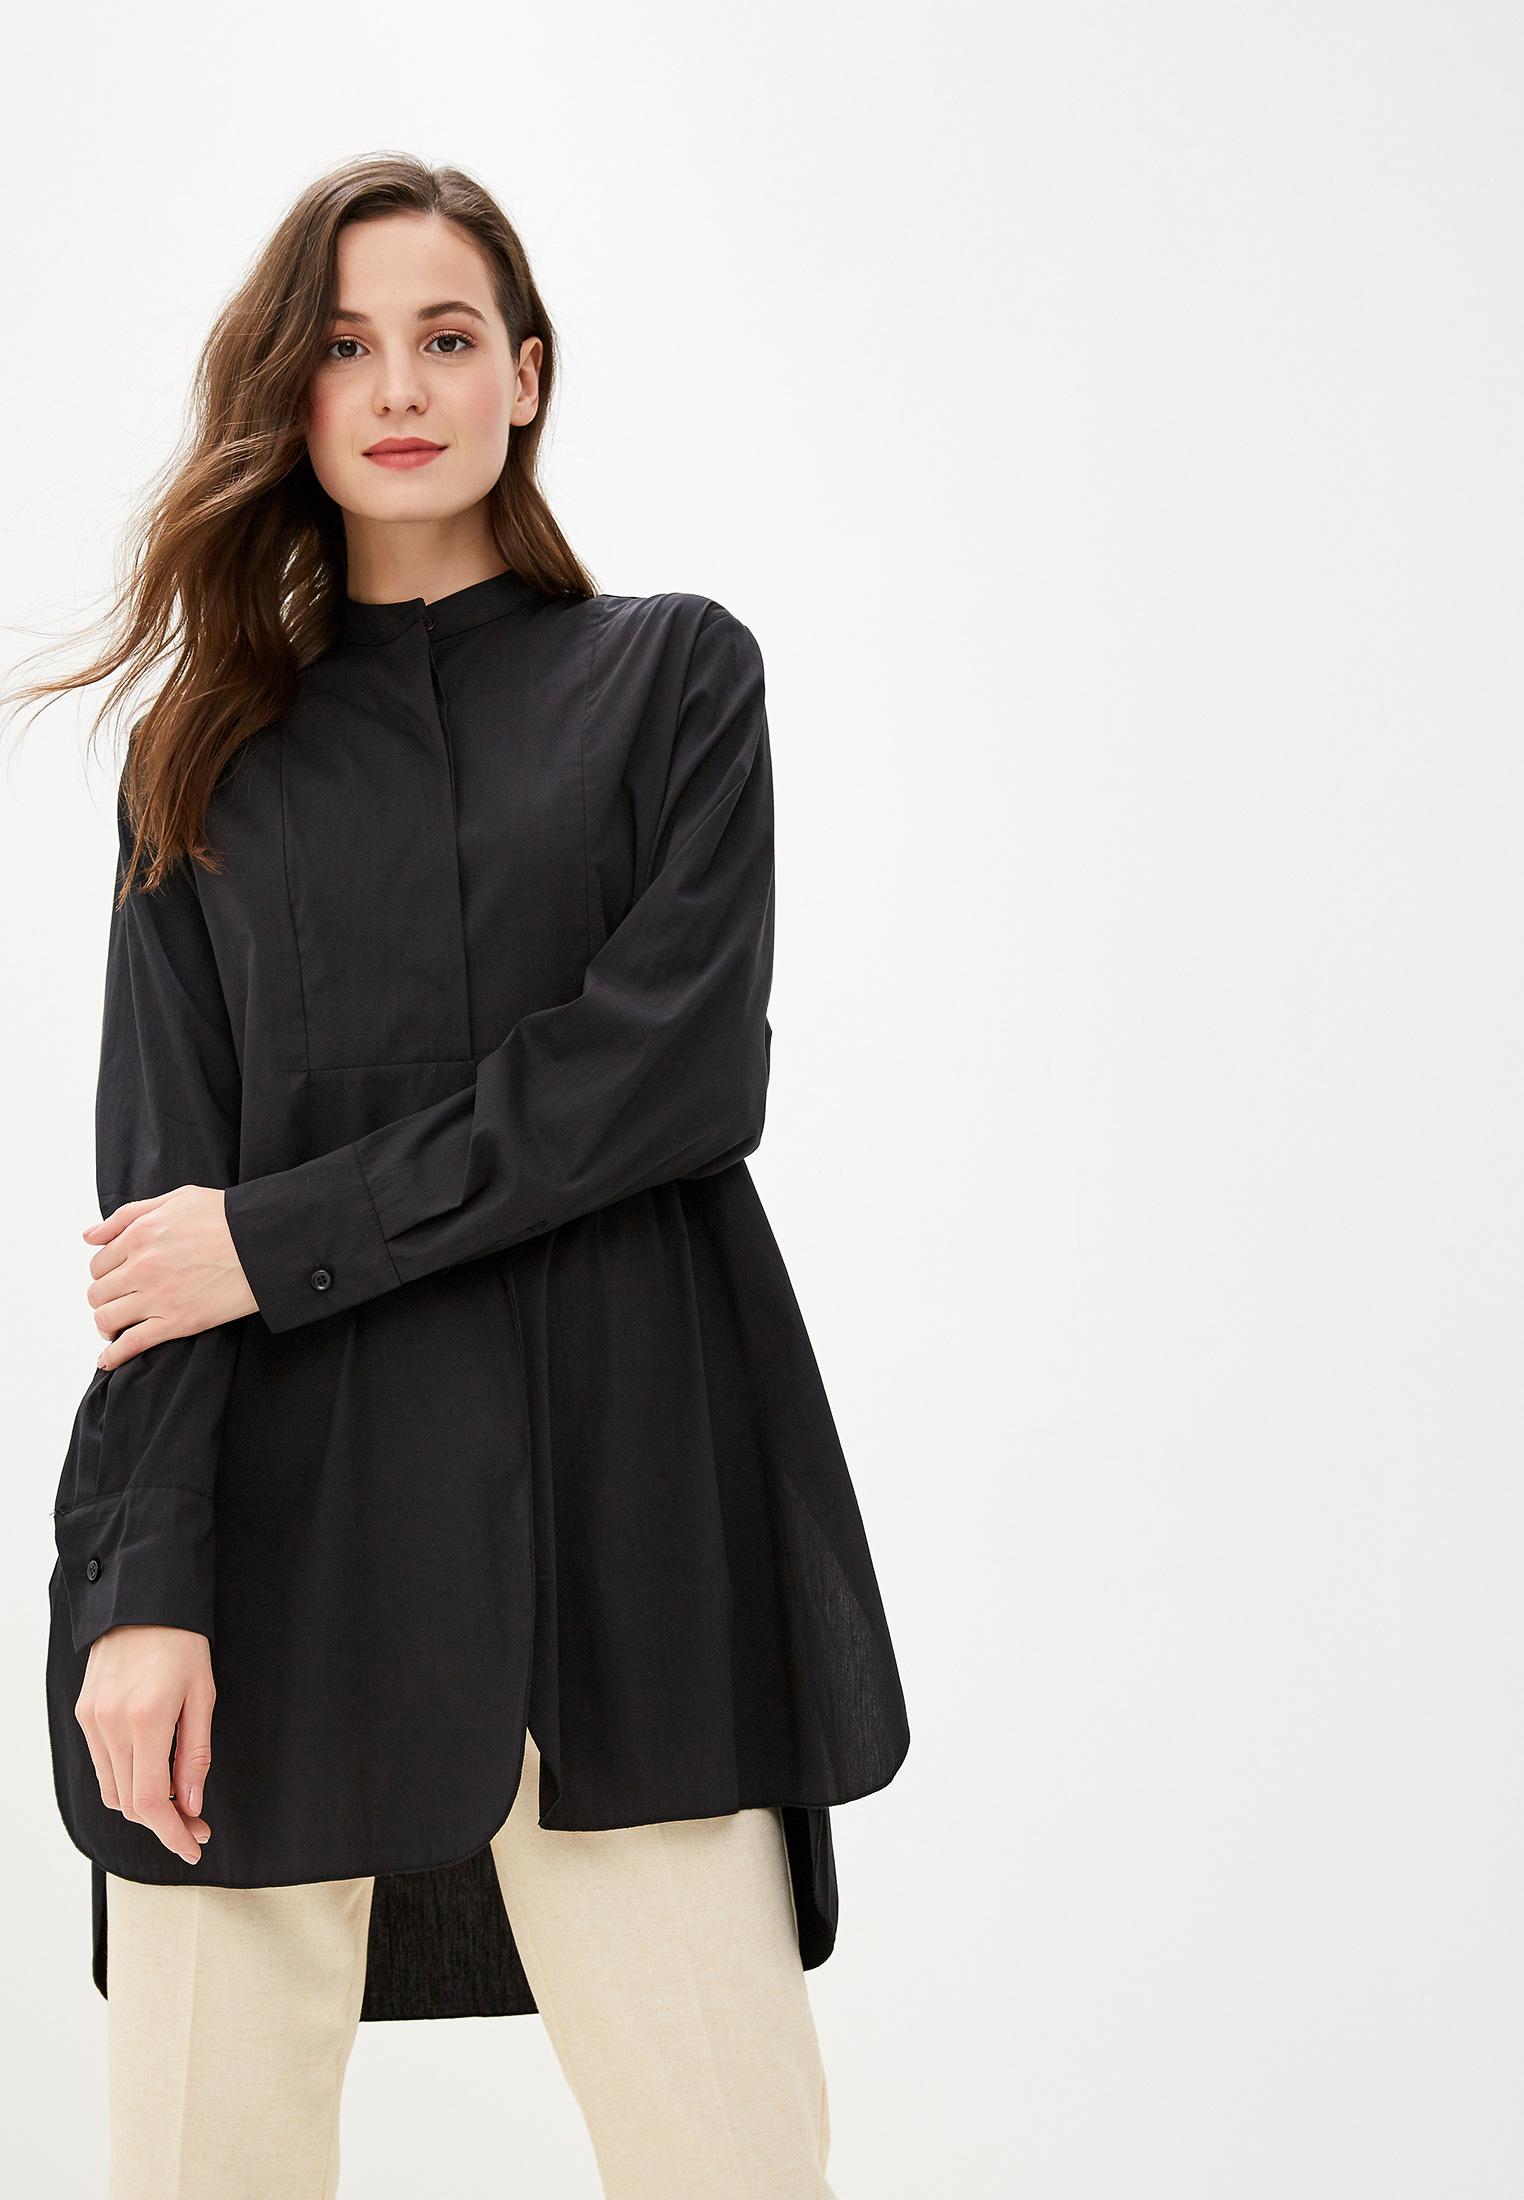 Женские рубашки с длинным рукавом Massimiliano Bini LA119-5017